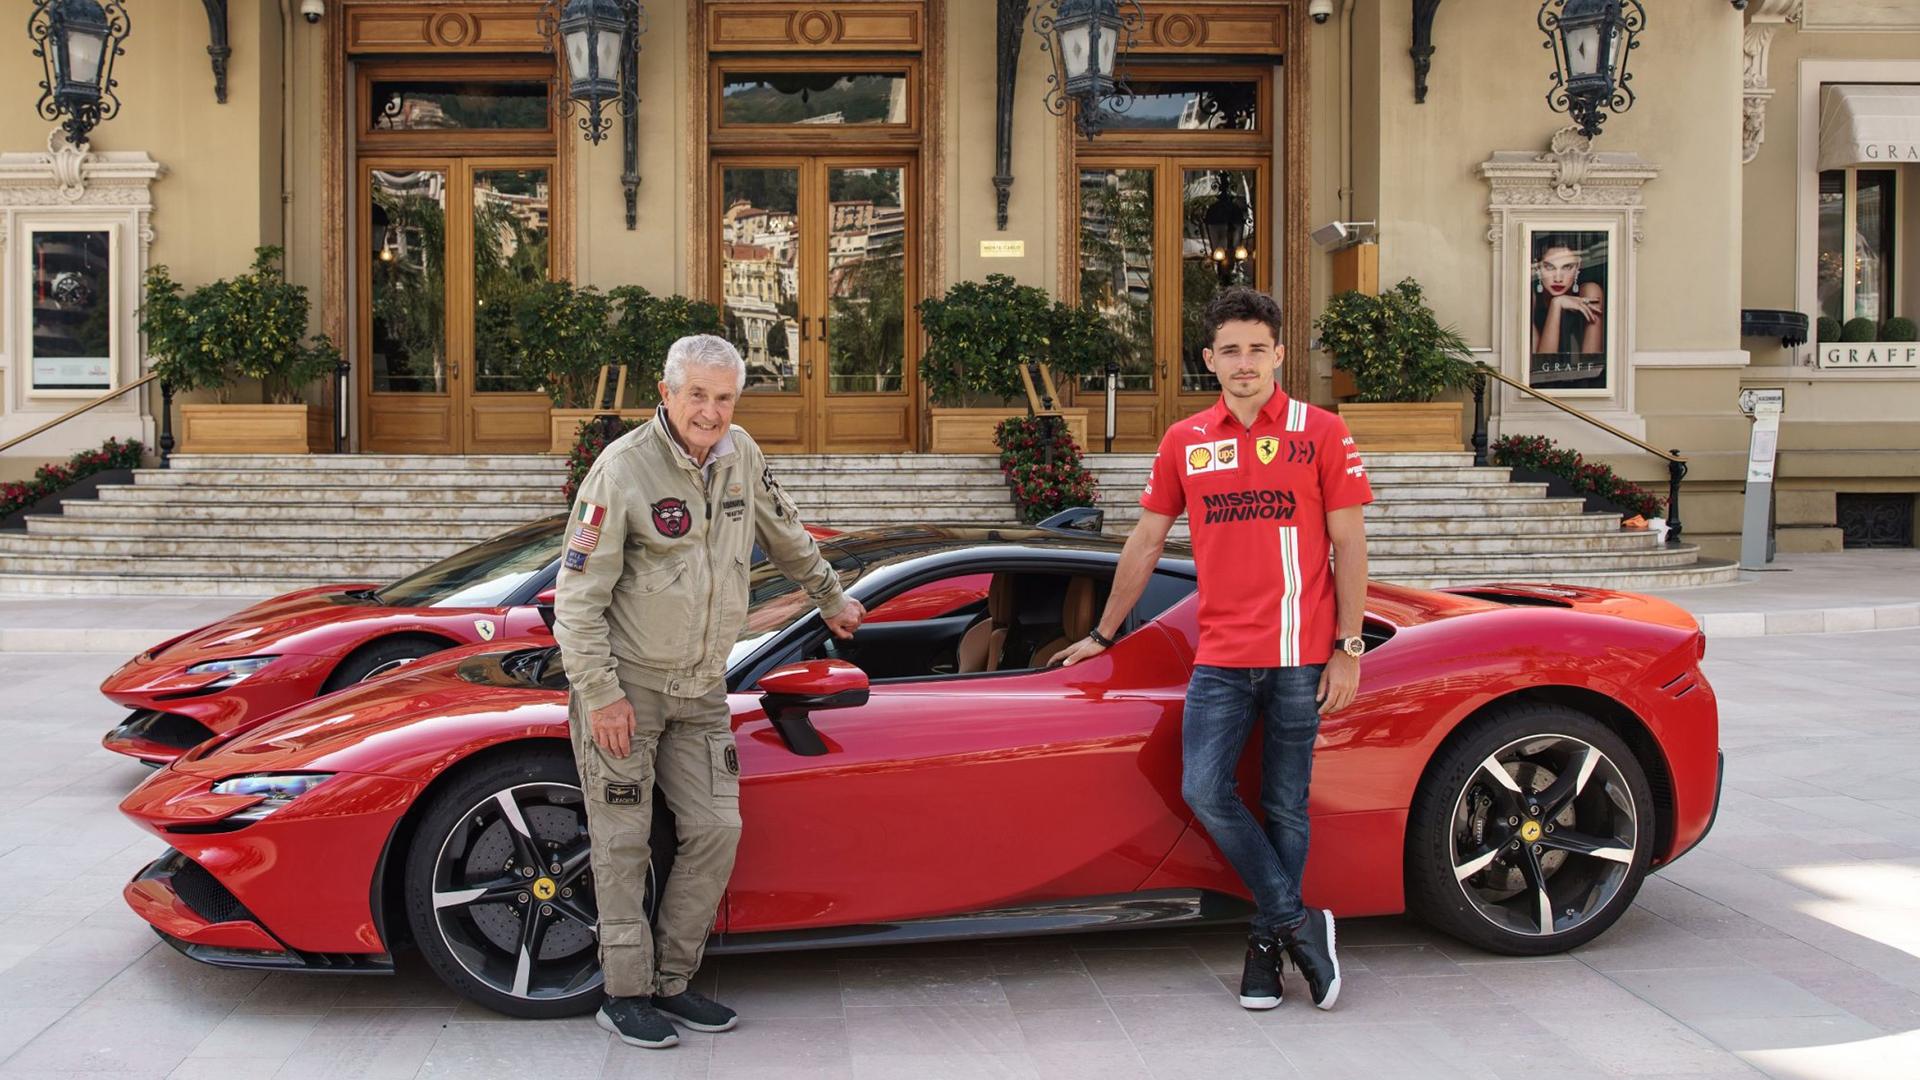 Watch Charles Leclerc Turns Stunt Driver As He Blasts A Ferrari Sf90 Around Monaco For C Etait Un Rendez Vous Tribute Formula 1